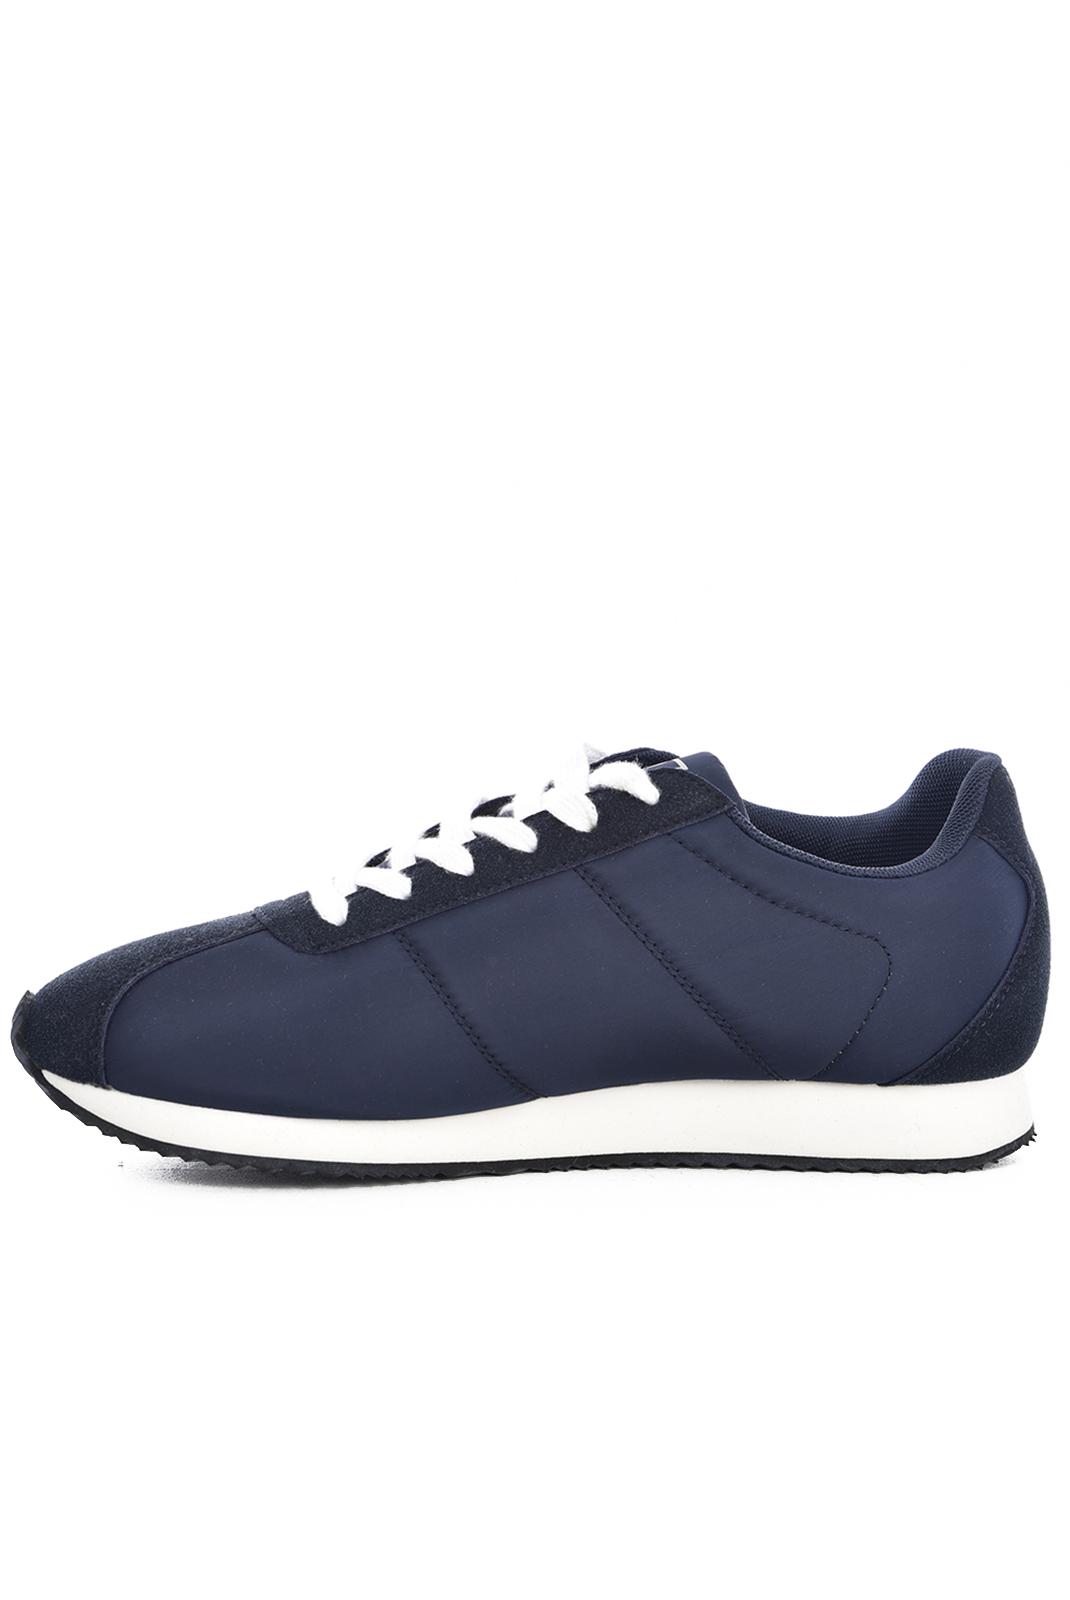 Baskets / Sport  Guess jeans FMTMM1FAB12 BLUE